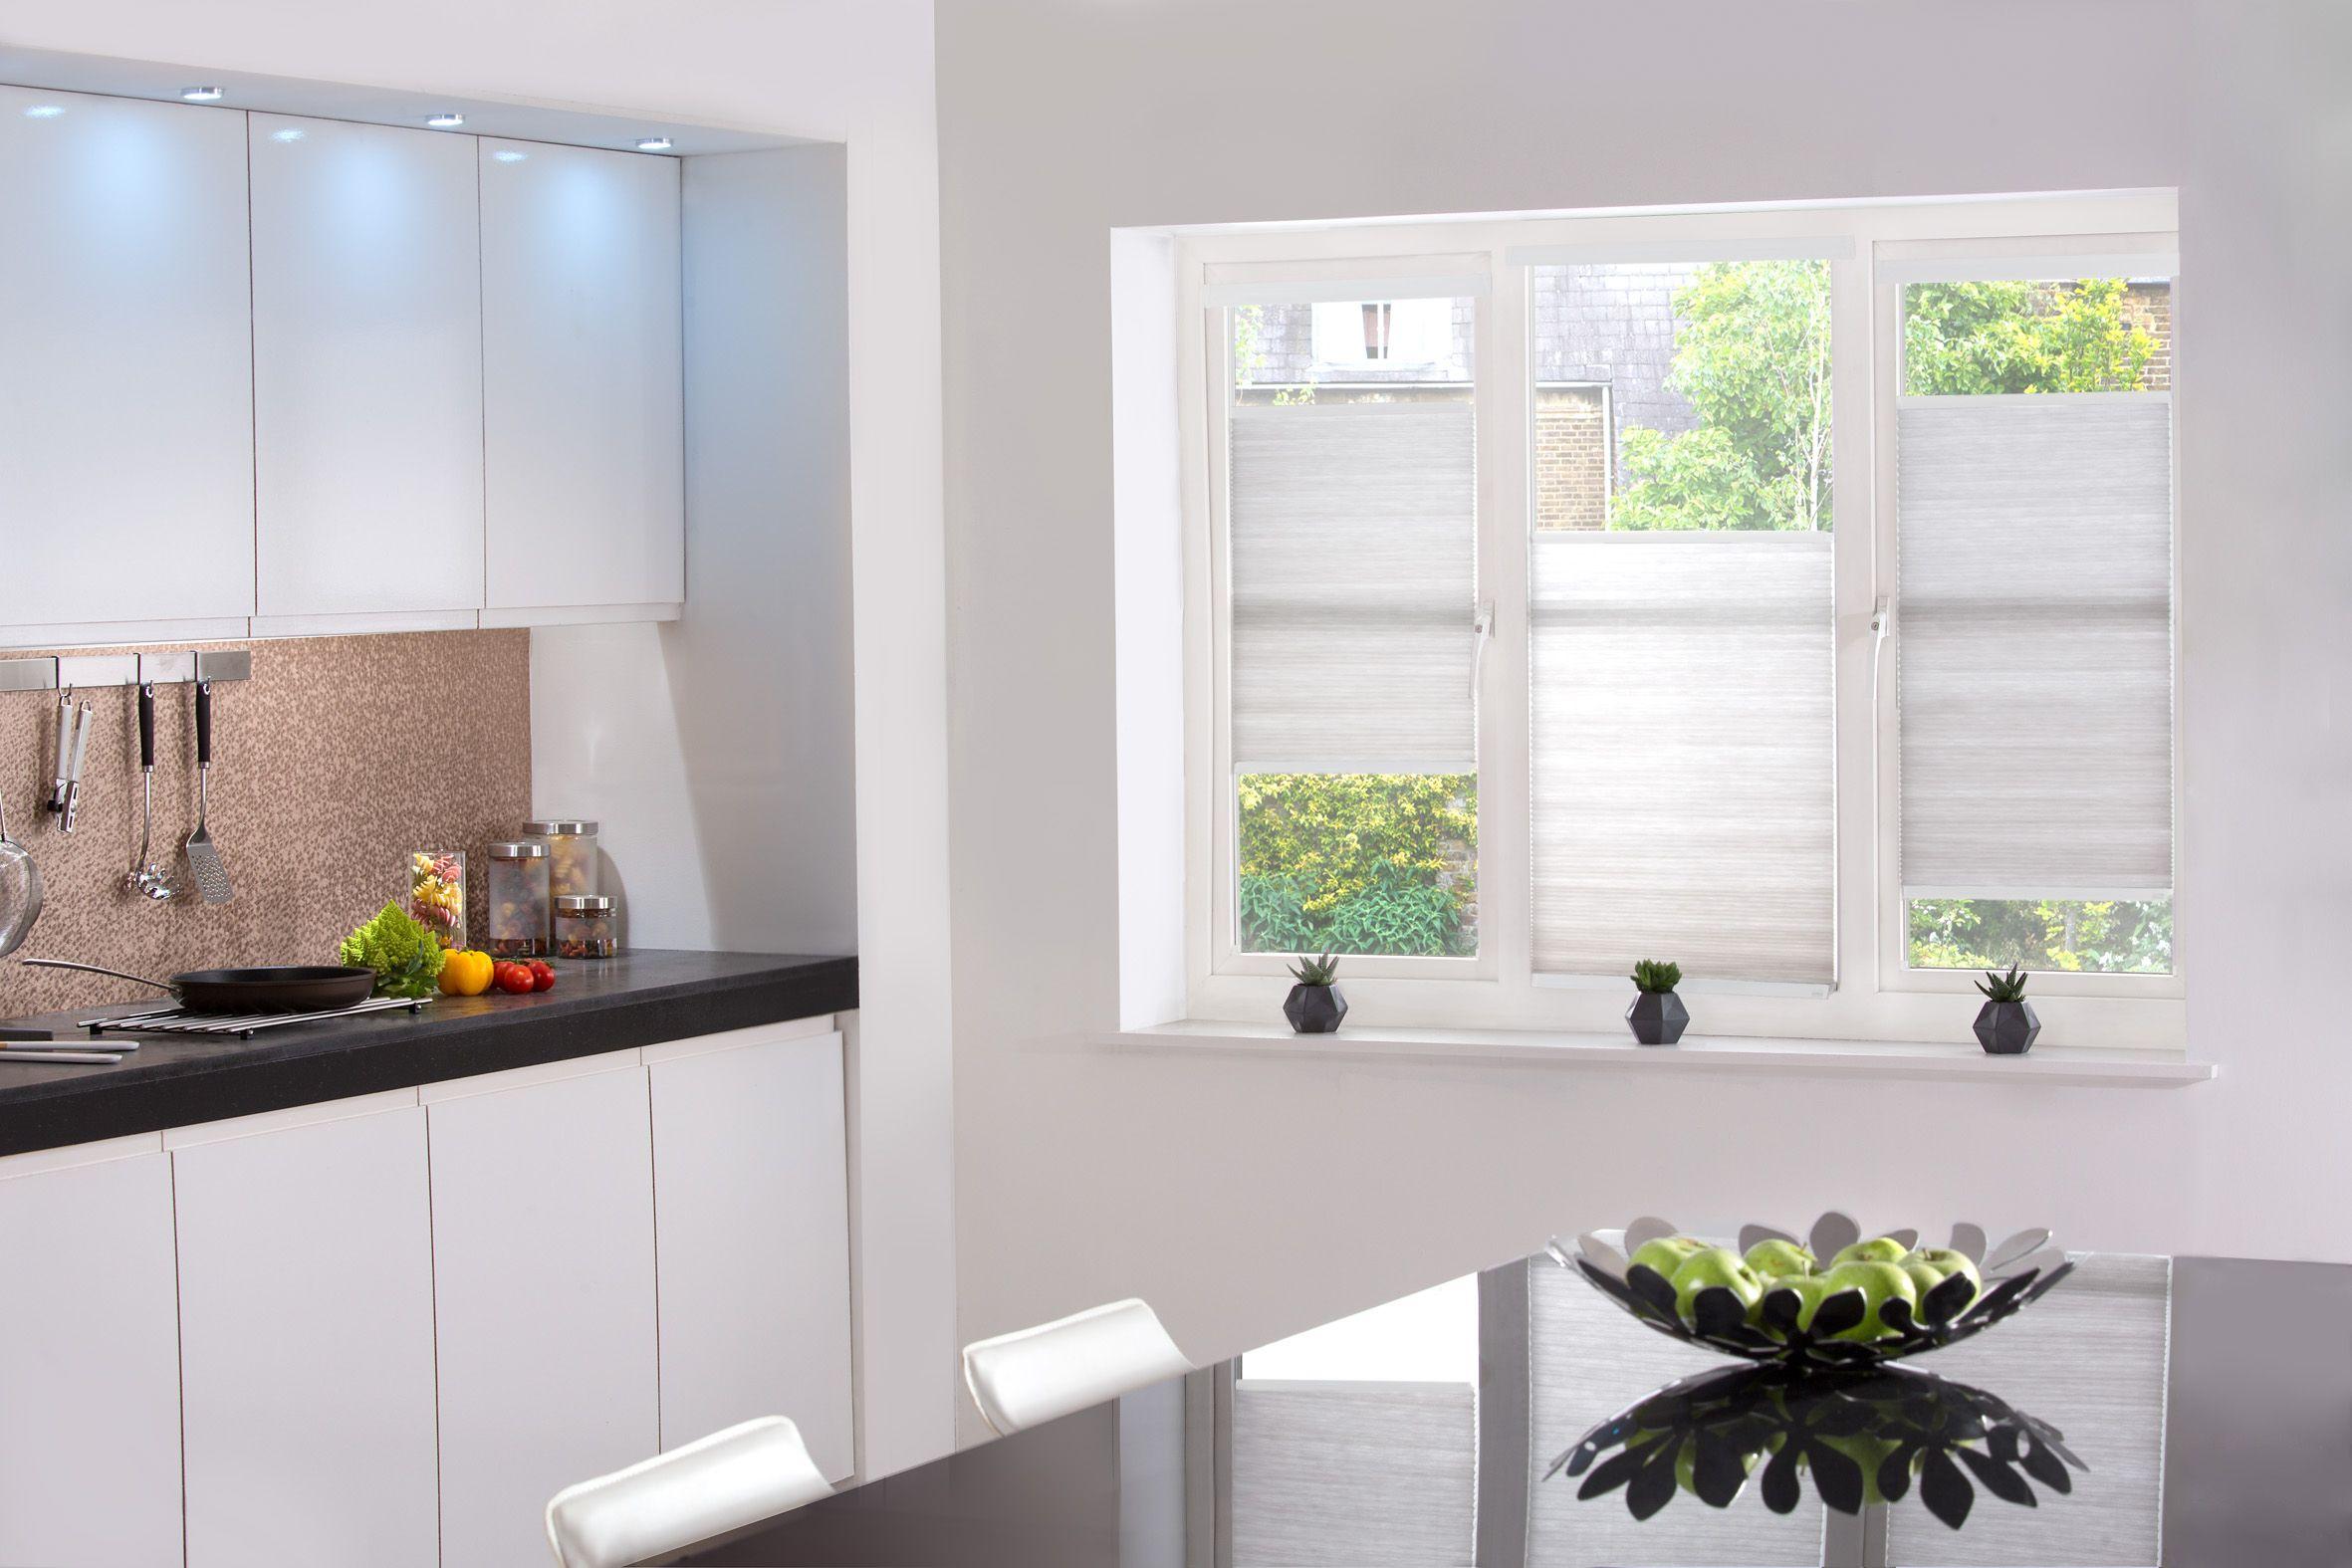 Kitchen window kitchen blinds  style studio hive silkweave blinds in ash kitchen blinds best